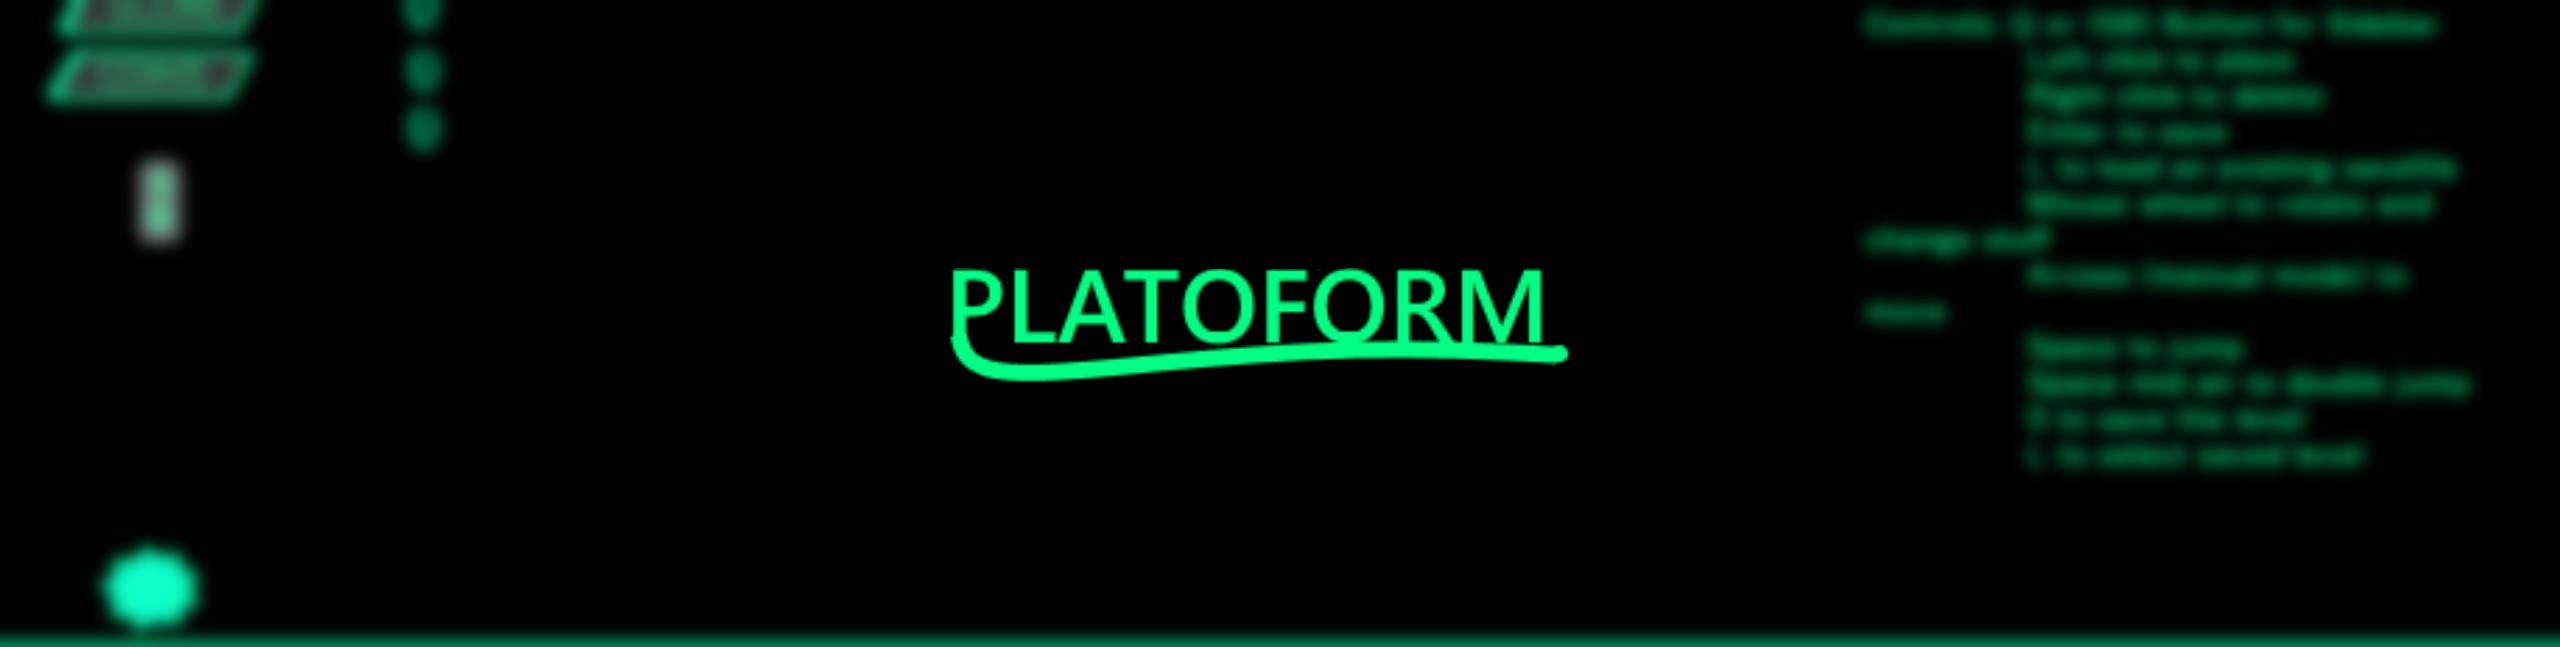 PlatoForm - Level Creator by bieftent